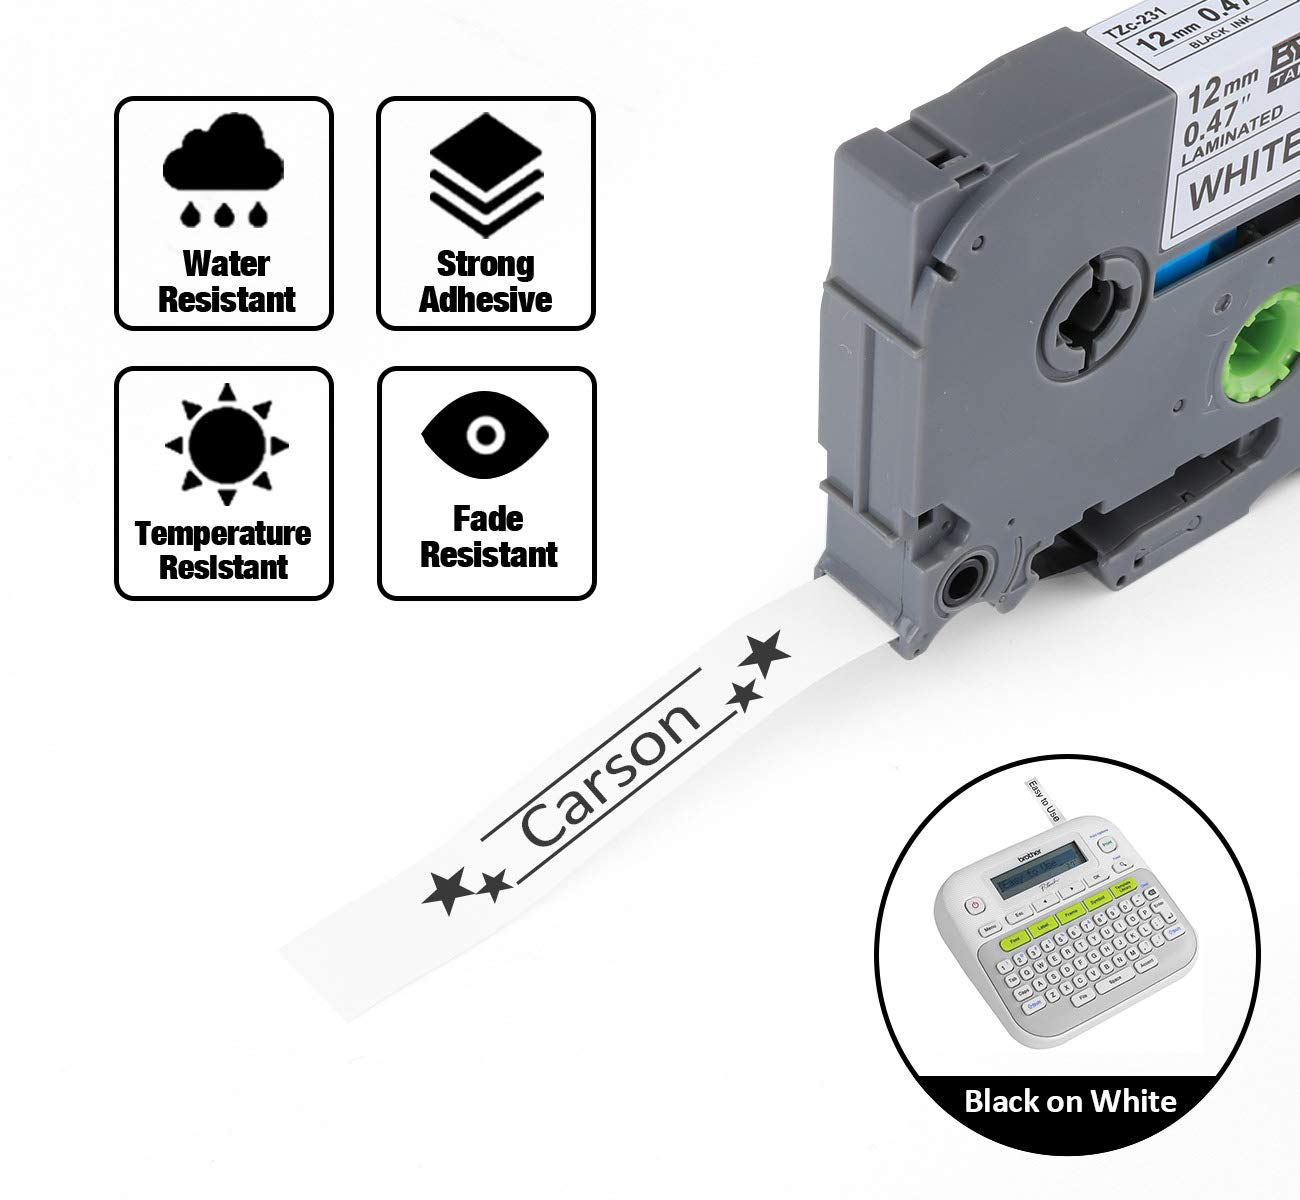 compatible con Brother P-Touch para etiquetas PT-E100 D210 P300BT 1010 4 cintas de etiquetas para etiquetadora negra sobre blanco 110CH y 1230PC D200 H100 PT-E200 1090 12 mm x 8 m